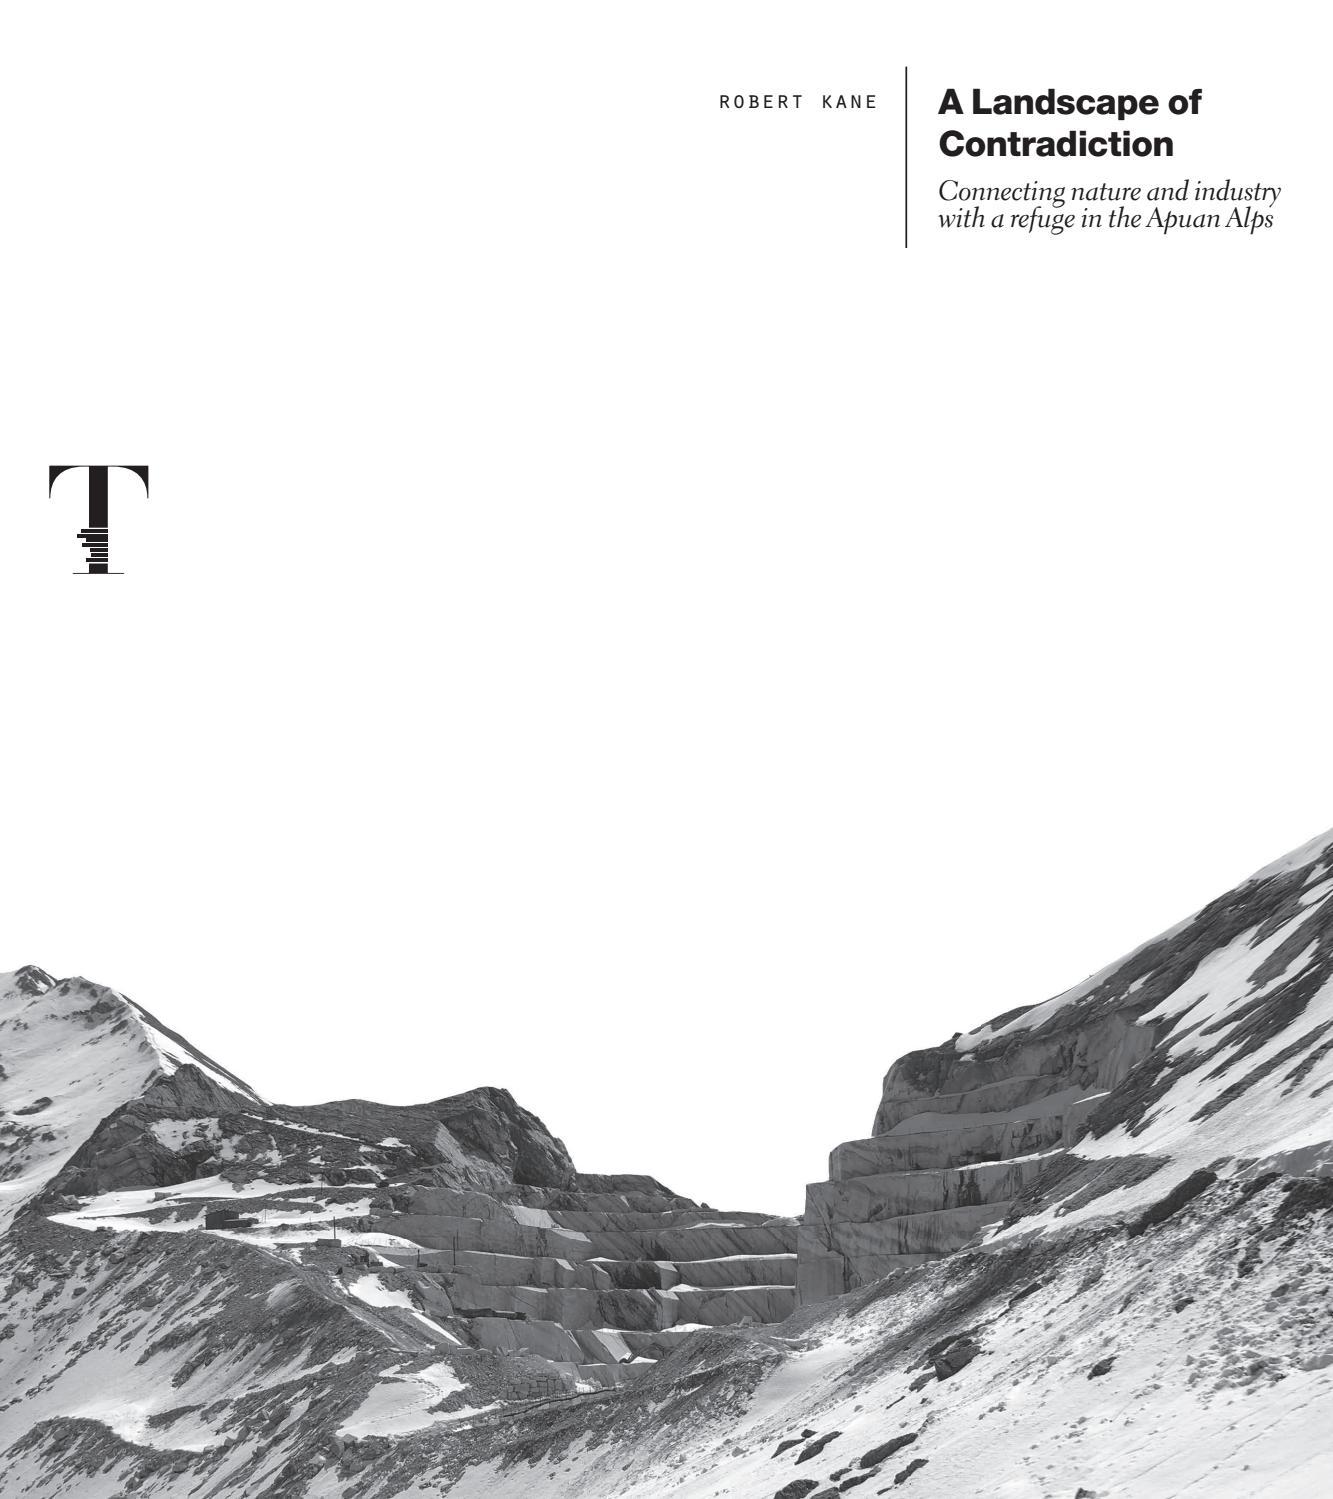 Studio Architettura Paesaggio Milano a landscape of contradiction | robert kane by dida - issuu